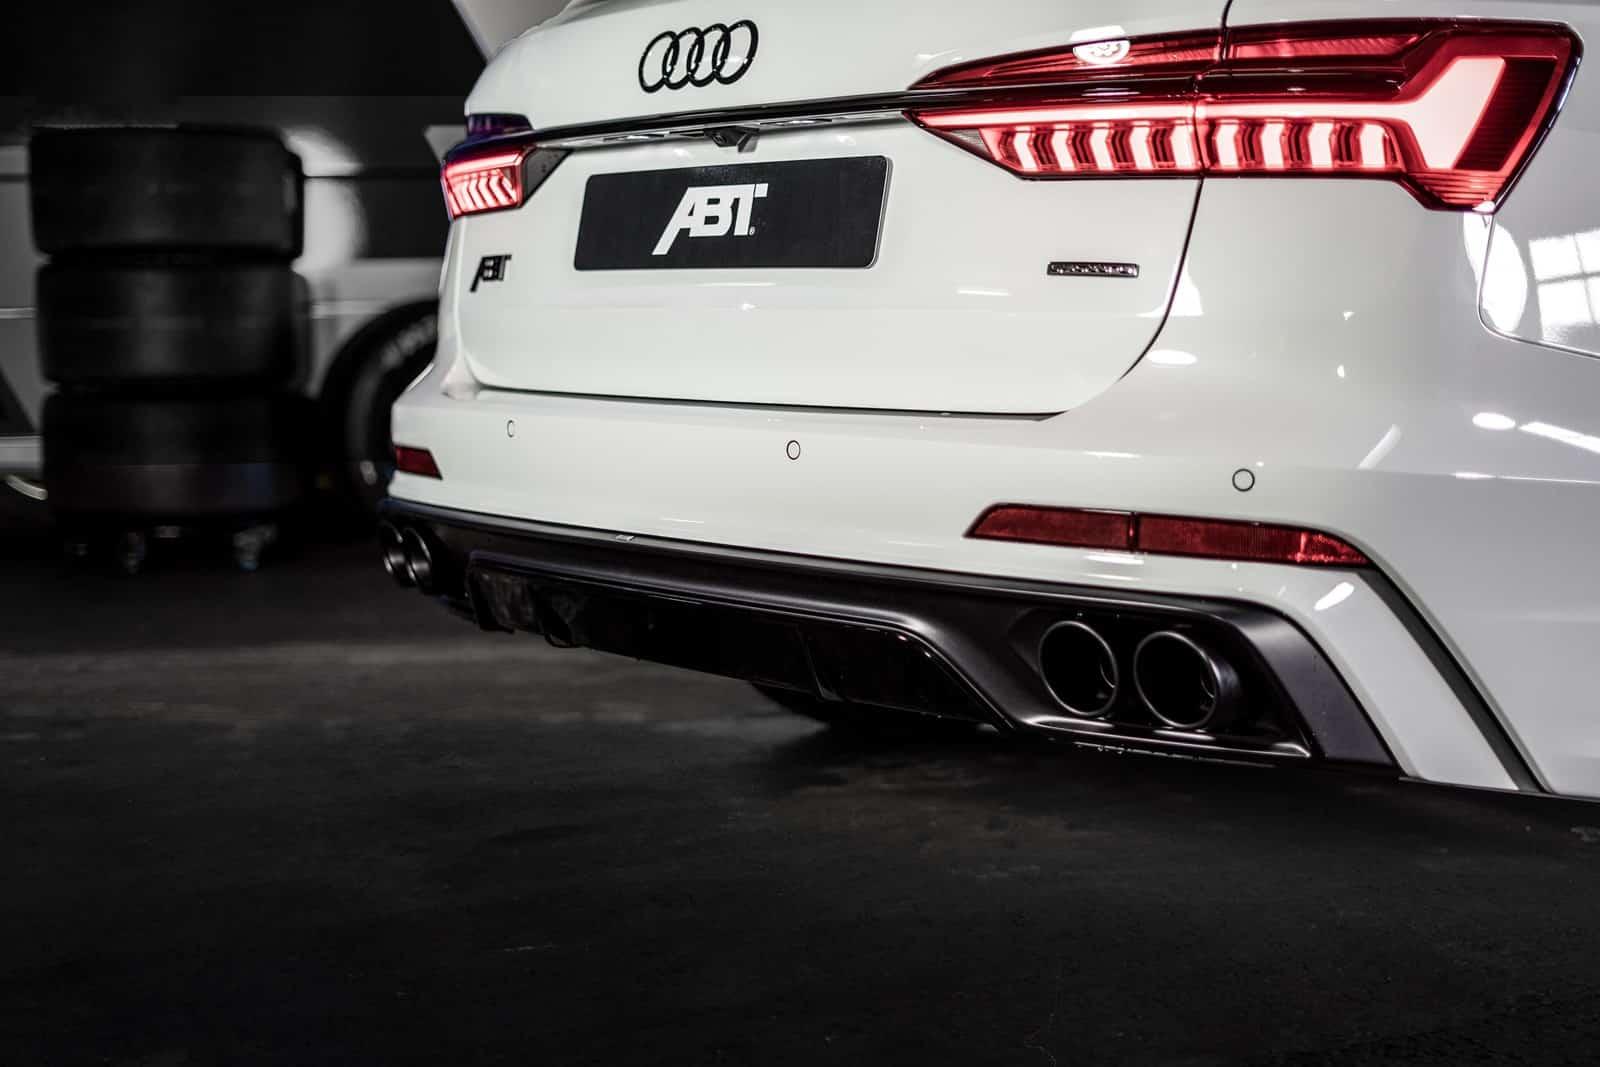 Audi-A6-Avant-ABT-aero-package-7.jpg